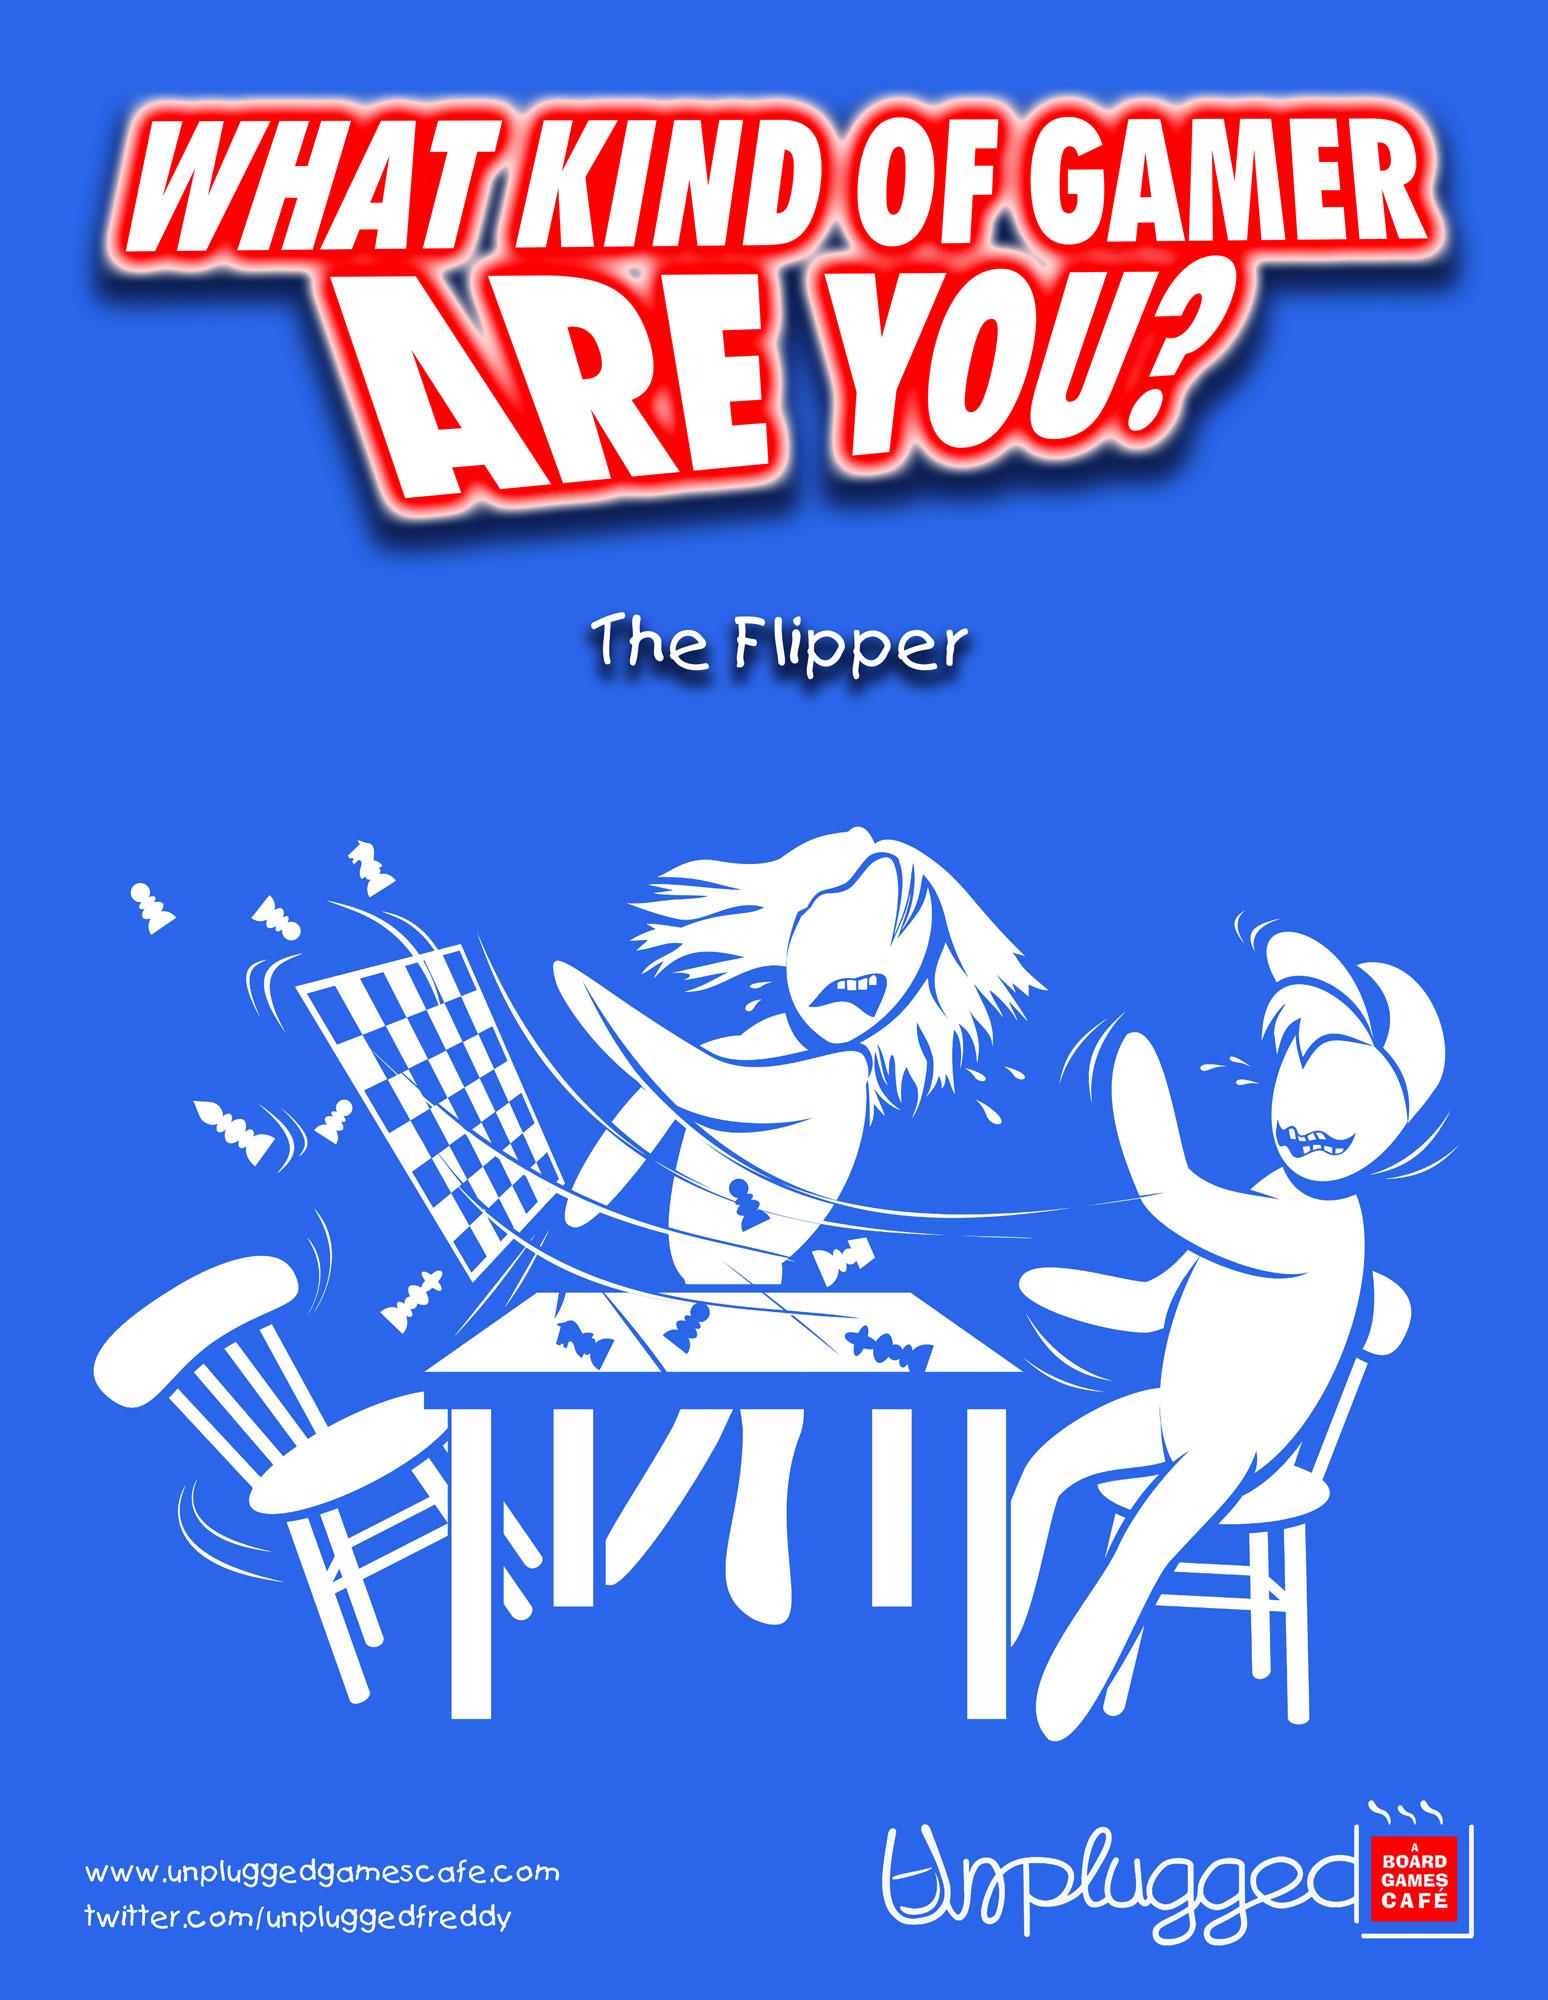 02.-The-flipper